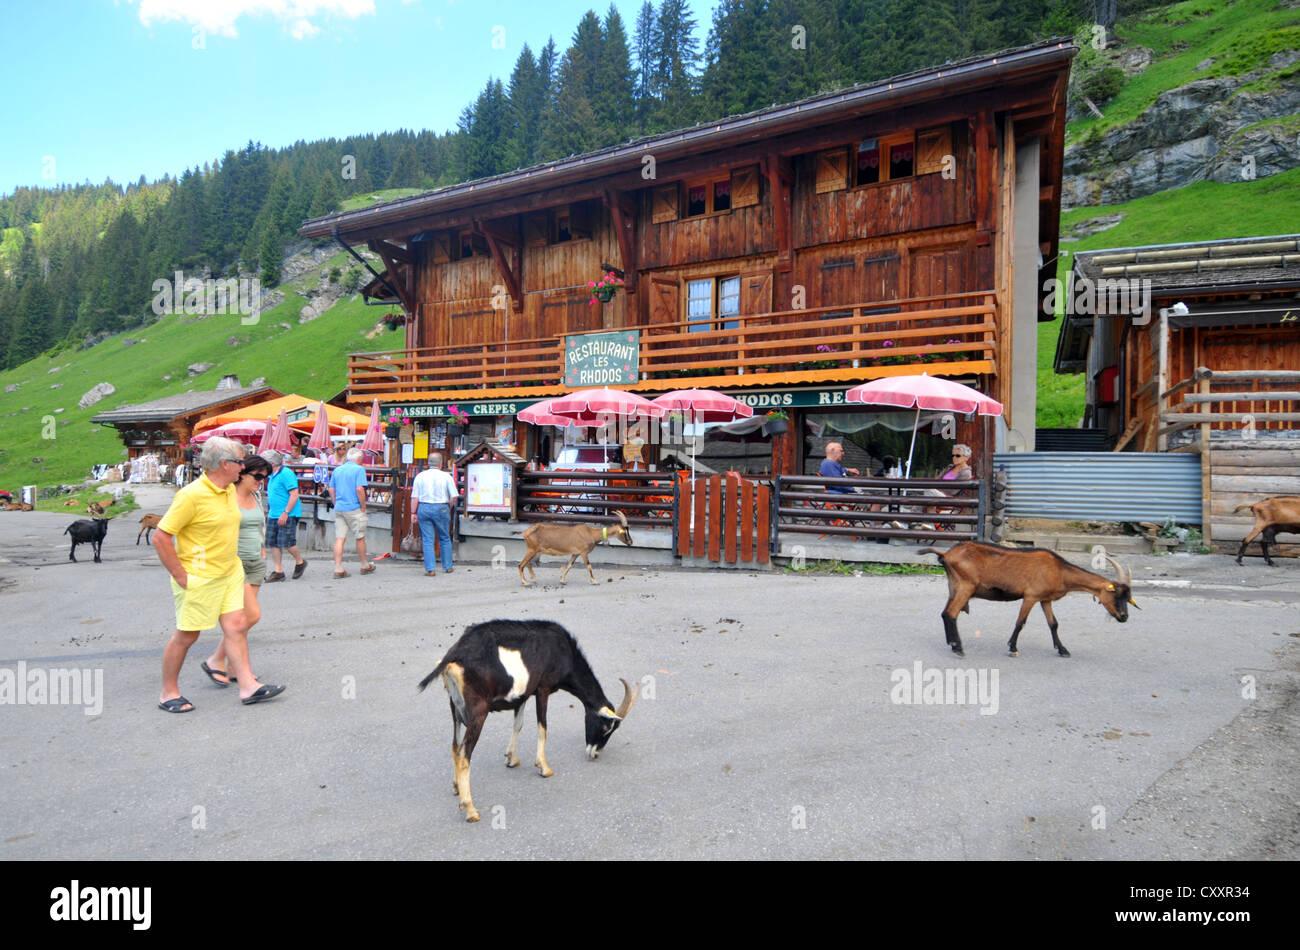 Les Lindarets goat village, Les Lindarets, France - Stock Image